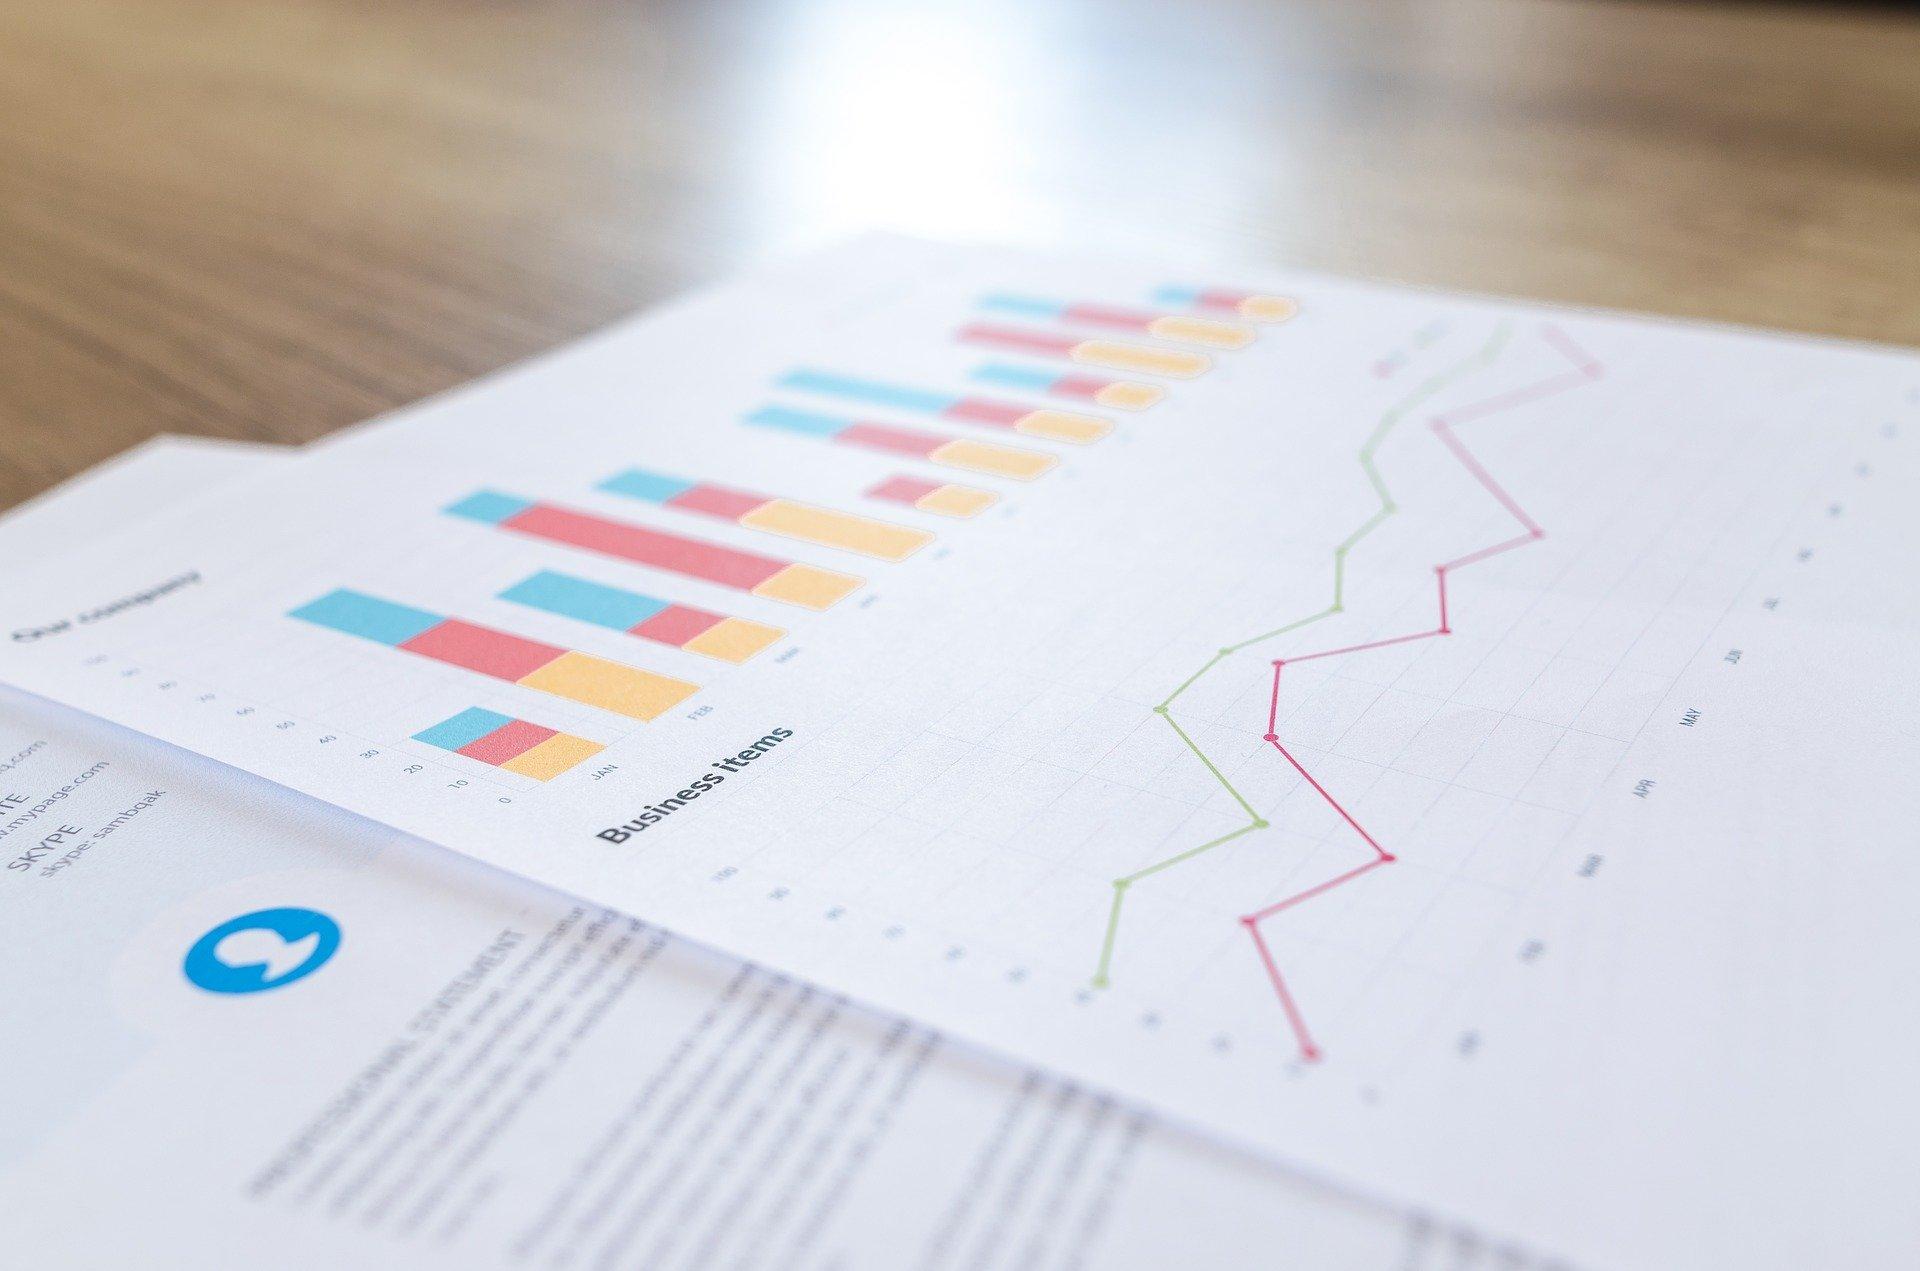 Value analysis / Value Engineering